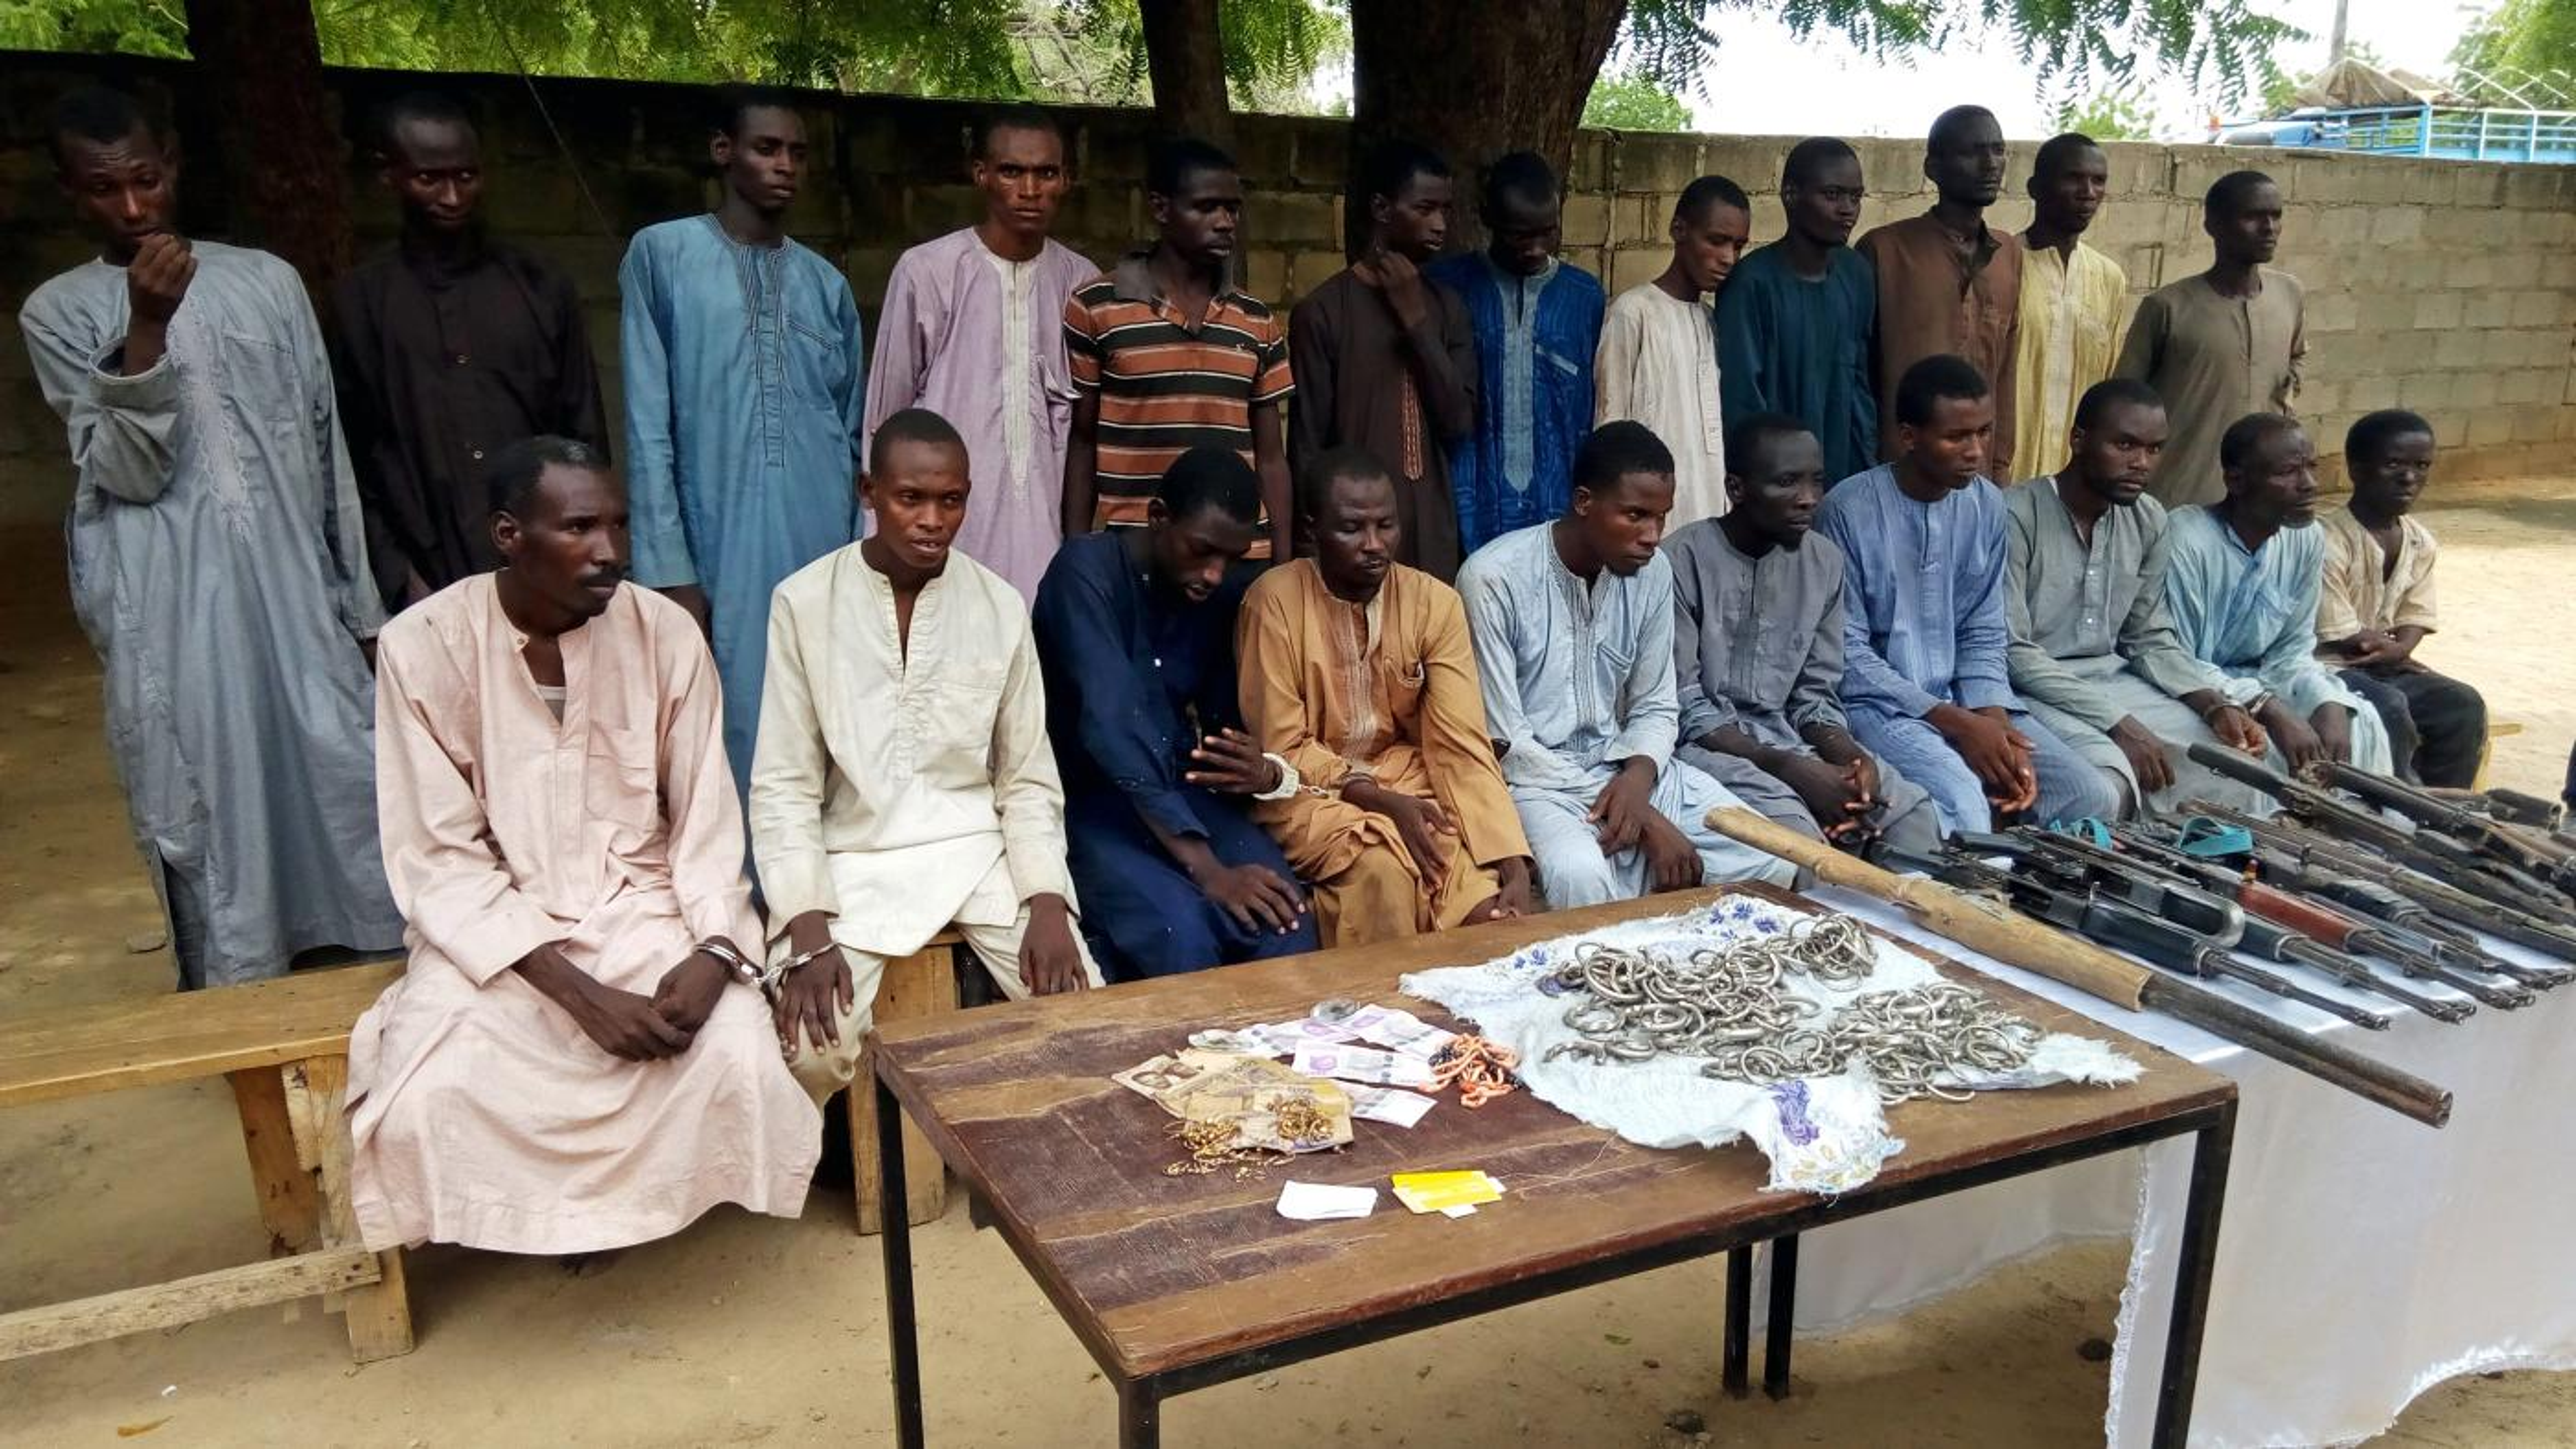 Boko Haram's 10-year reign in Nigeria has been devastating - Quartz Africa